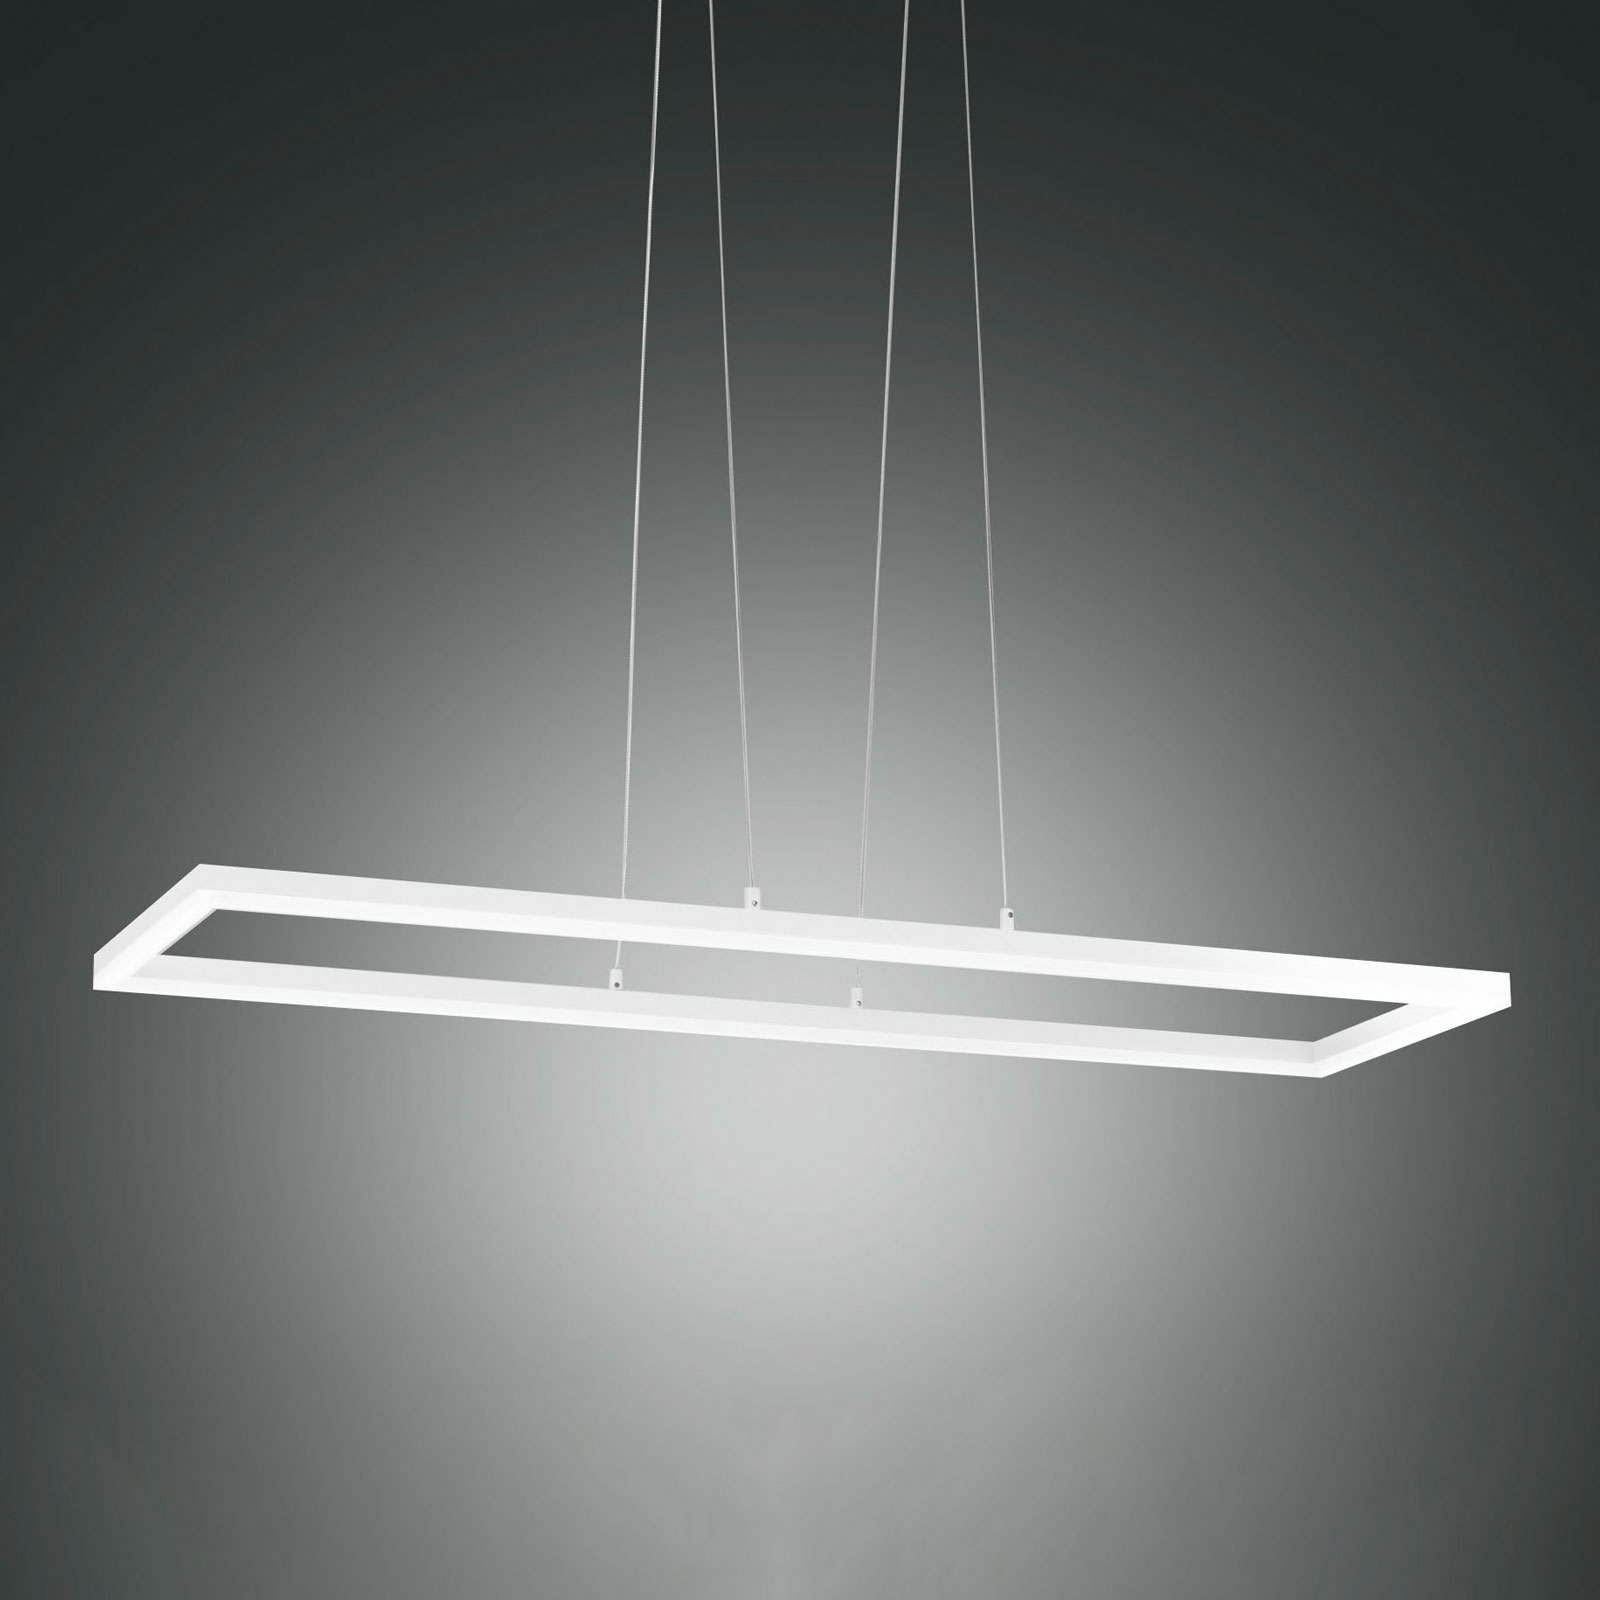 LED-Pendelleuchte Bard, 92x32 cm in Weiß